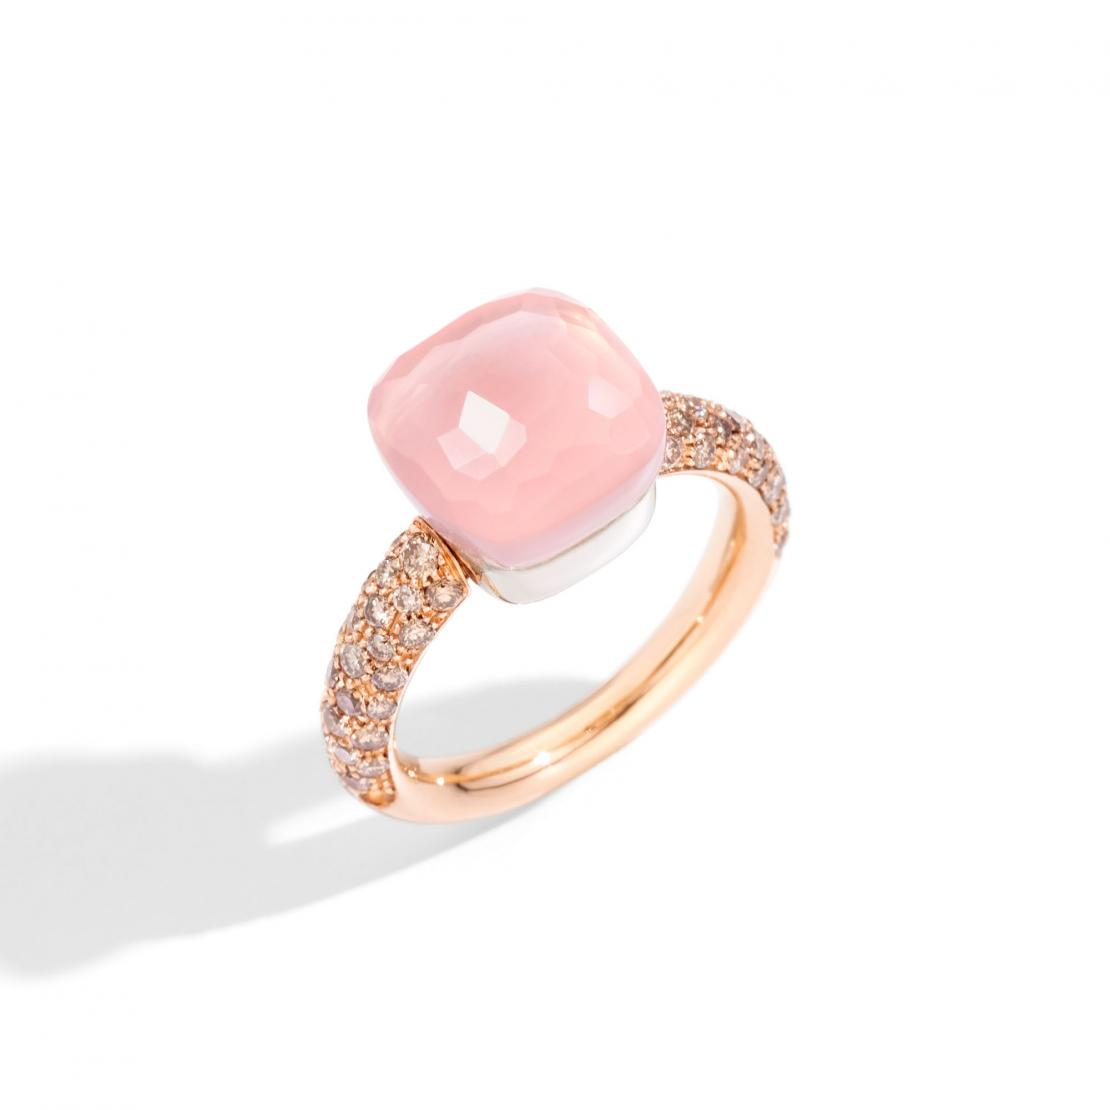 Pomellato Nudo Classic Ring Rose Gold, Rose De France | Slaets